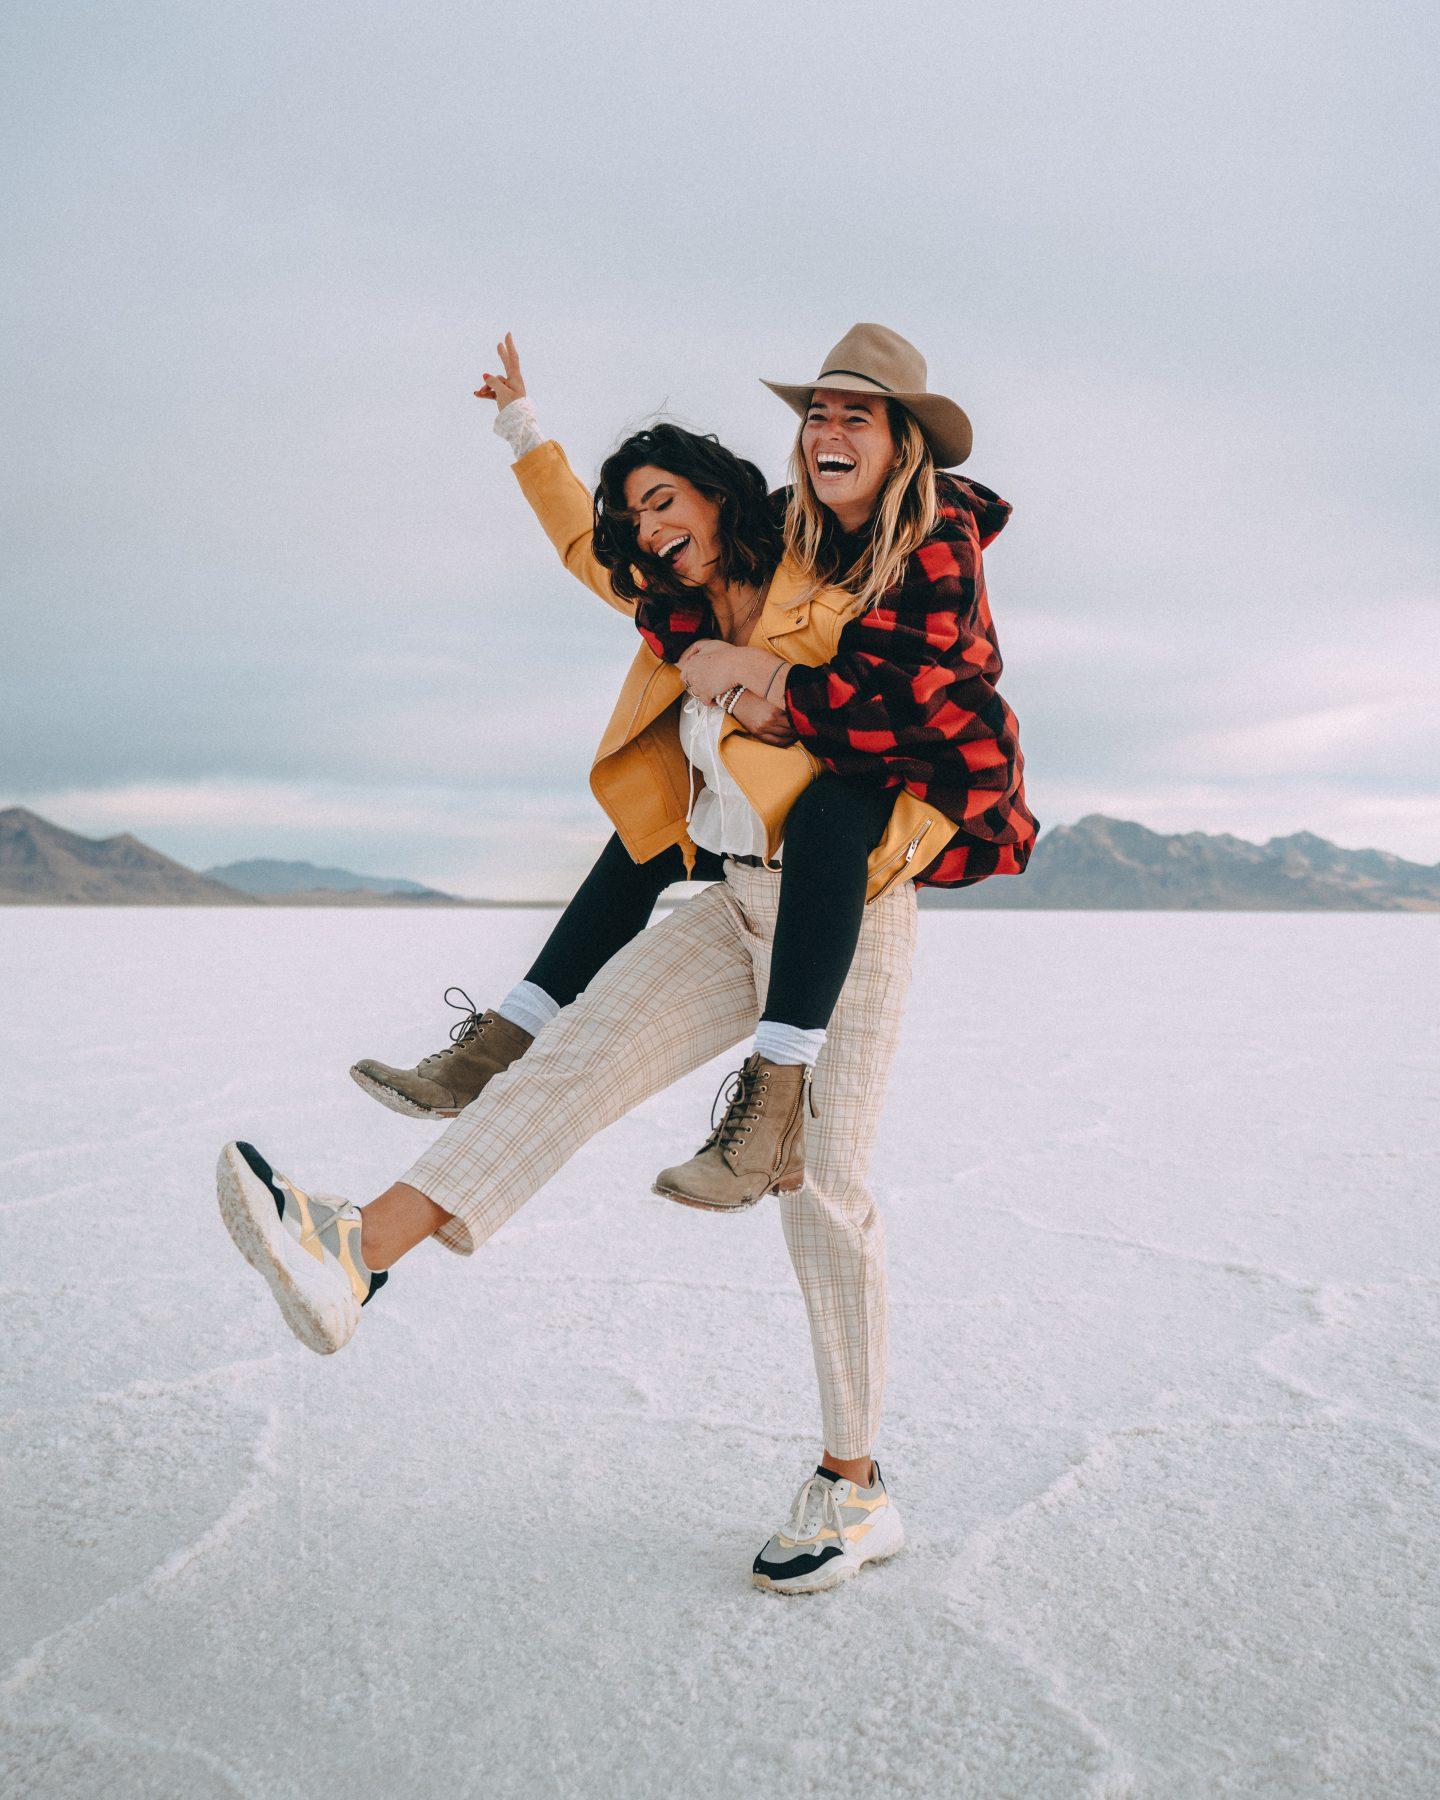 Women posting for Instagram at Bonneville Salt Flats on a road trip in Utah